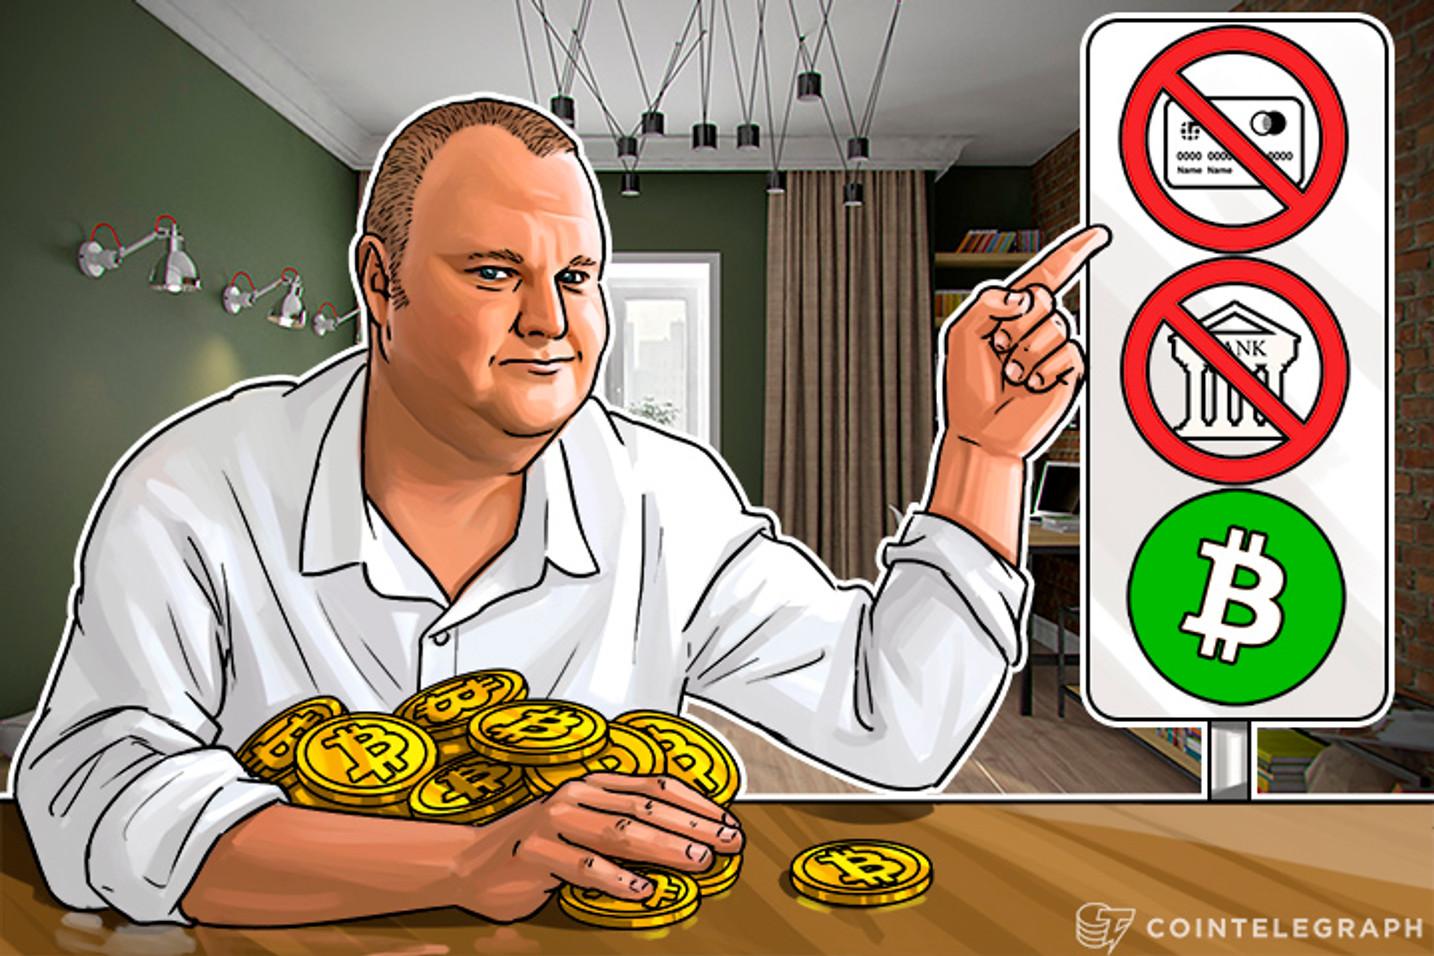 Investors in Kim Dotcom's Megaupload 2 Told To Stock Up On Bitcoin